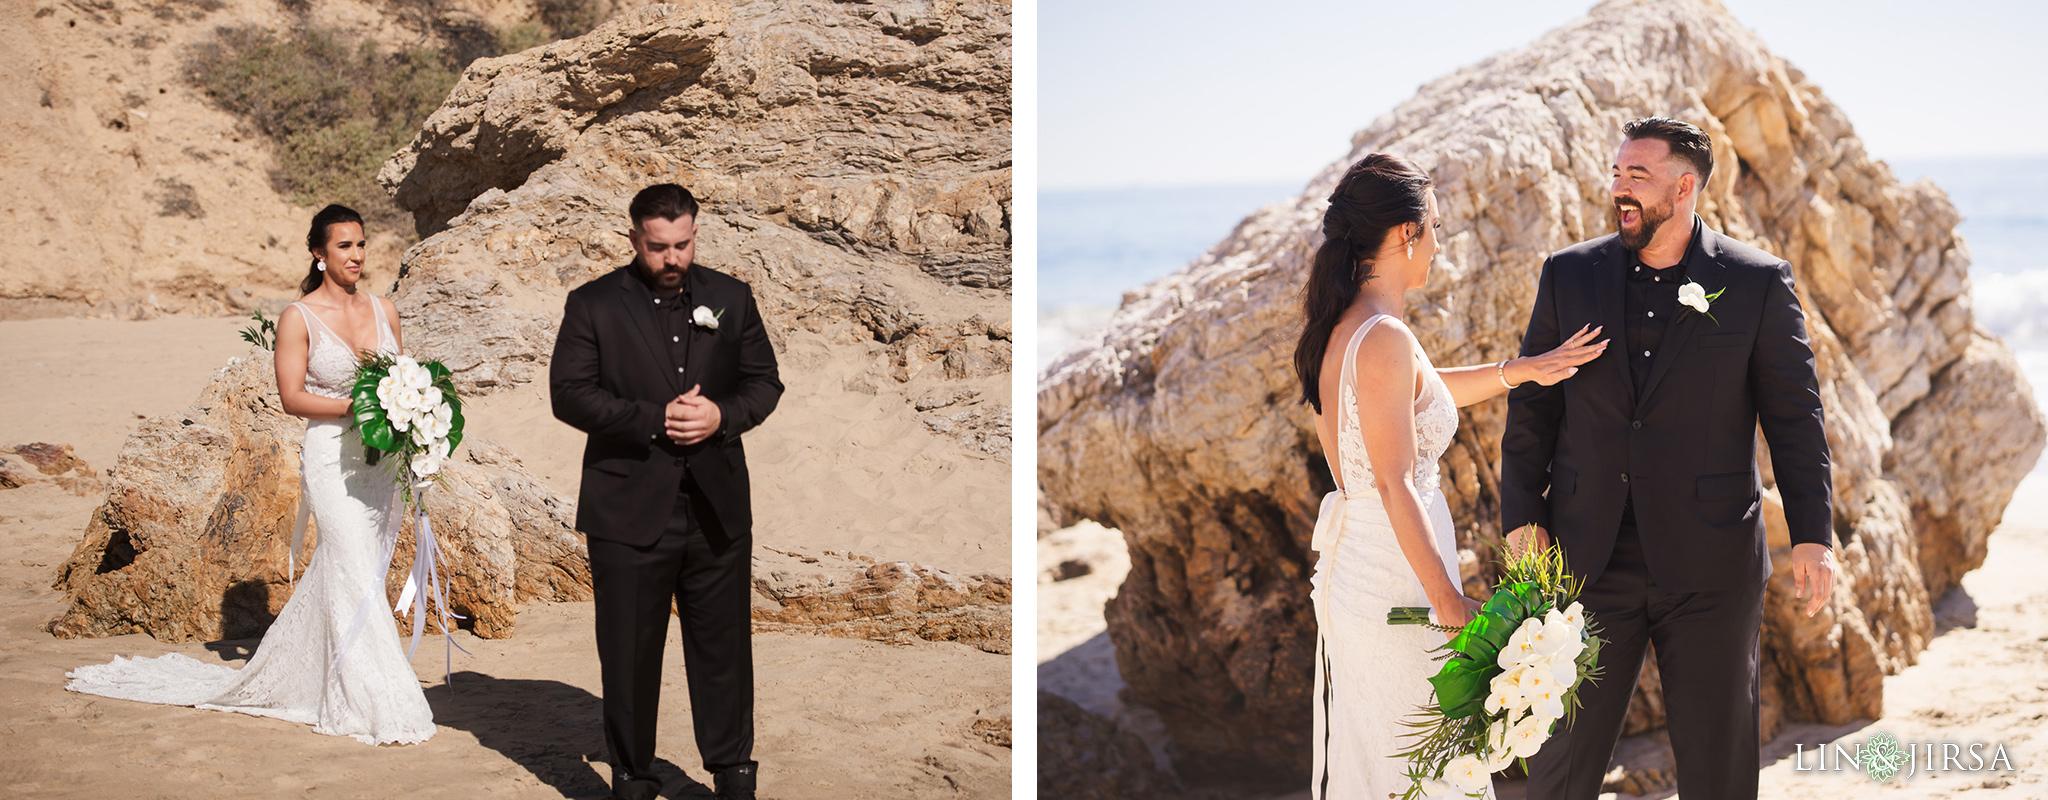 12 Crystal Cove State Park Laguna Beach Wedding Photography